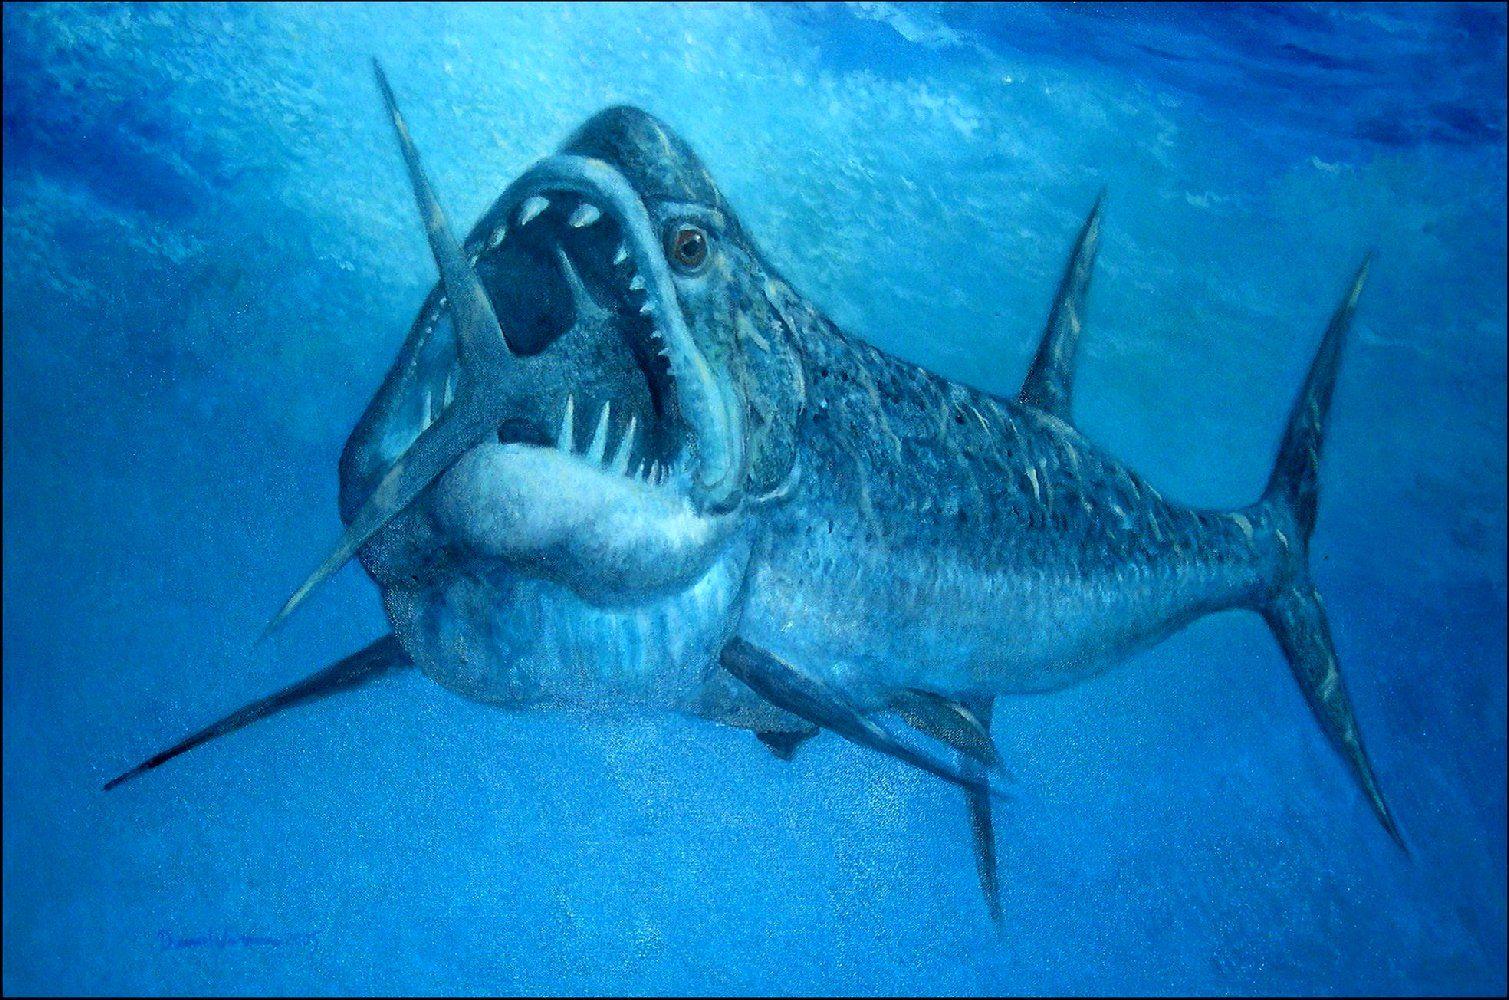 xiphactinus fish - HD1509×1000